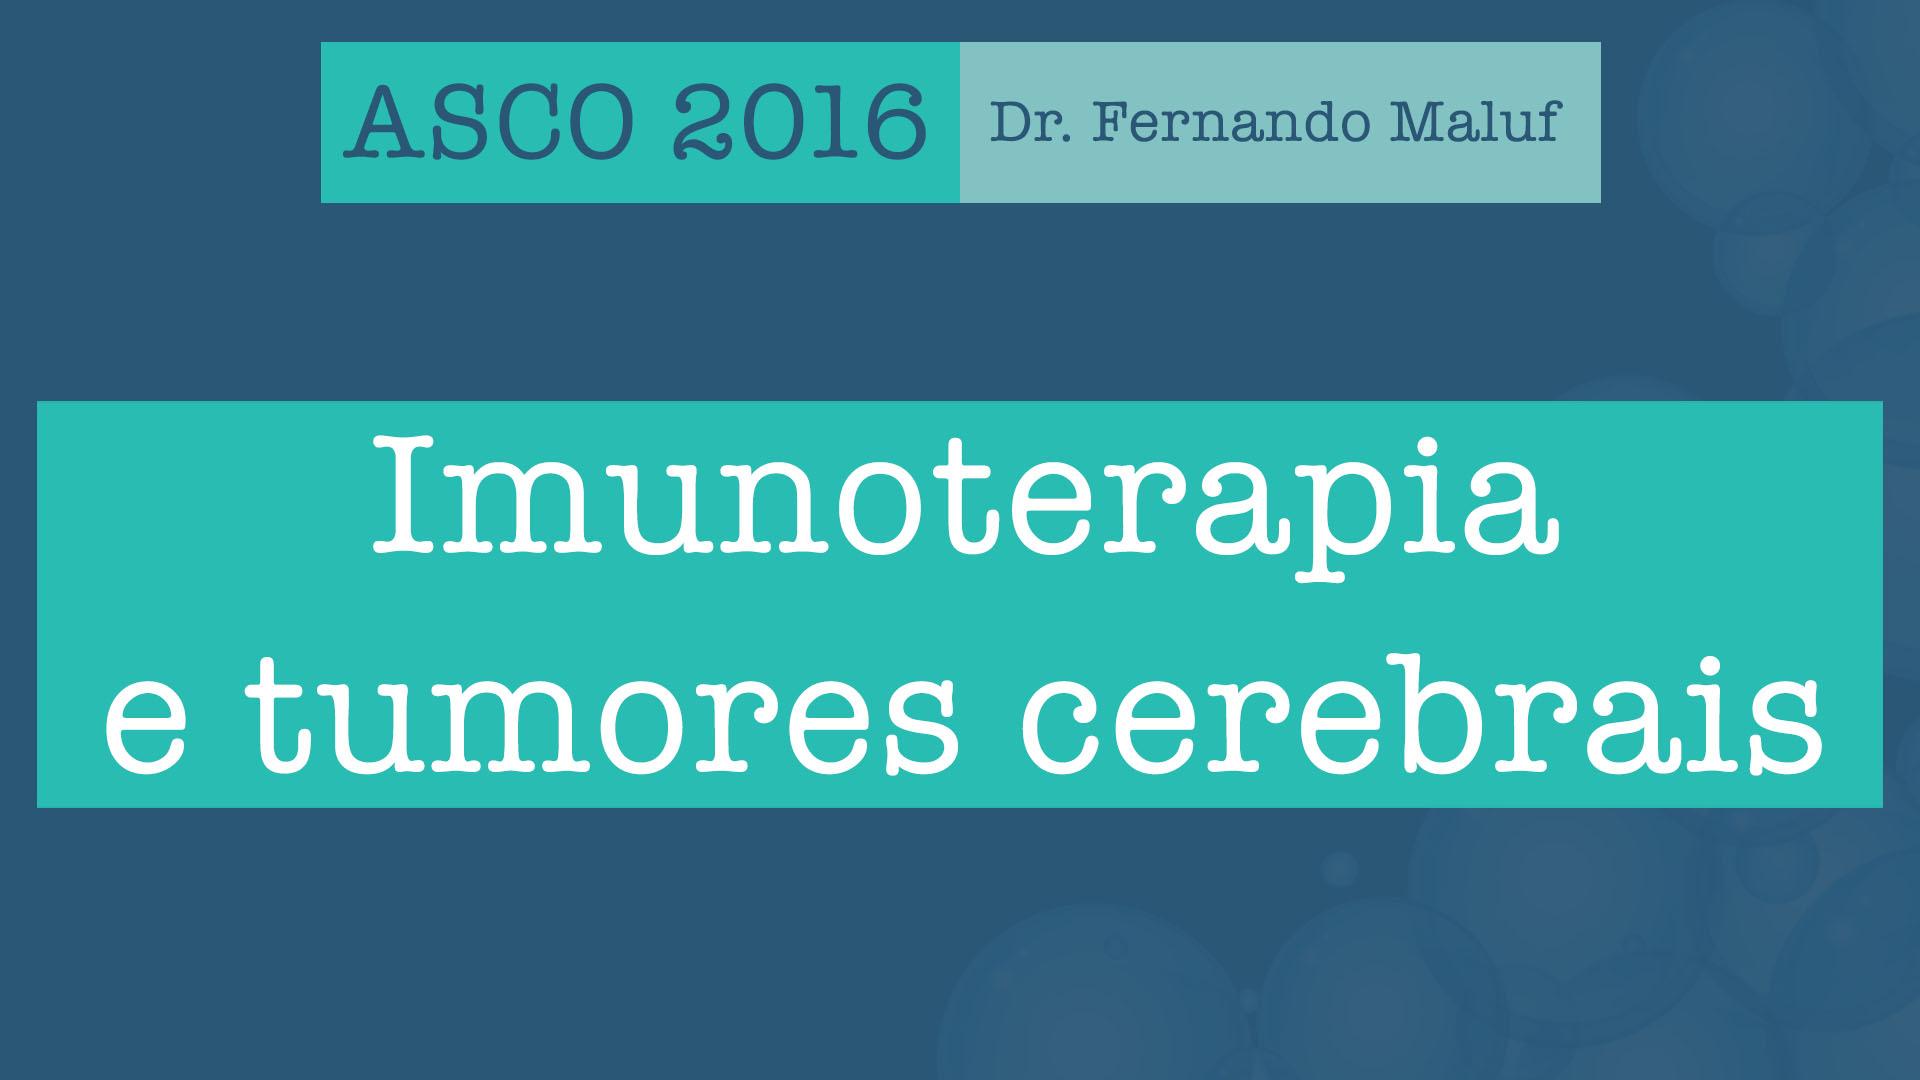 imunoterapia cerebrais asco 2016